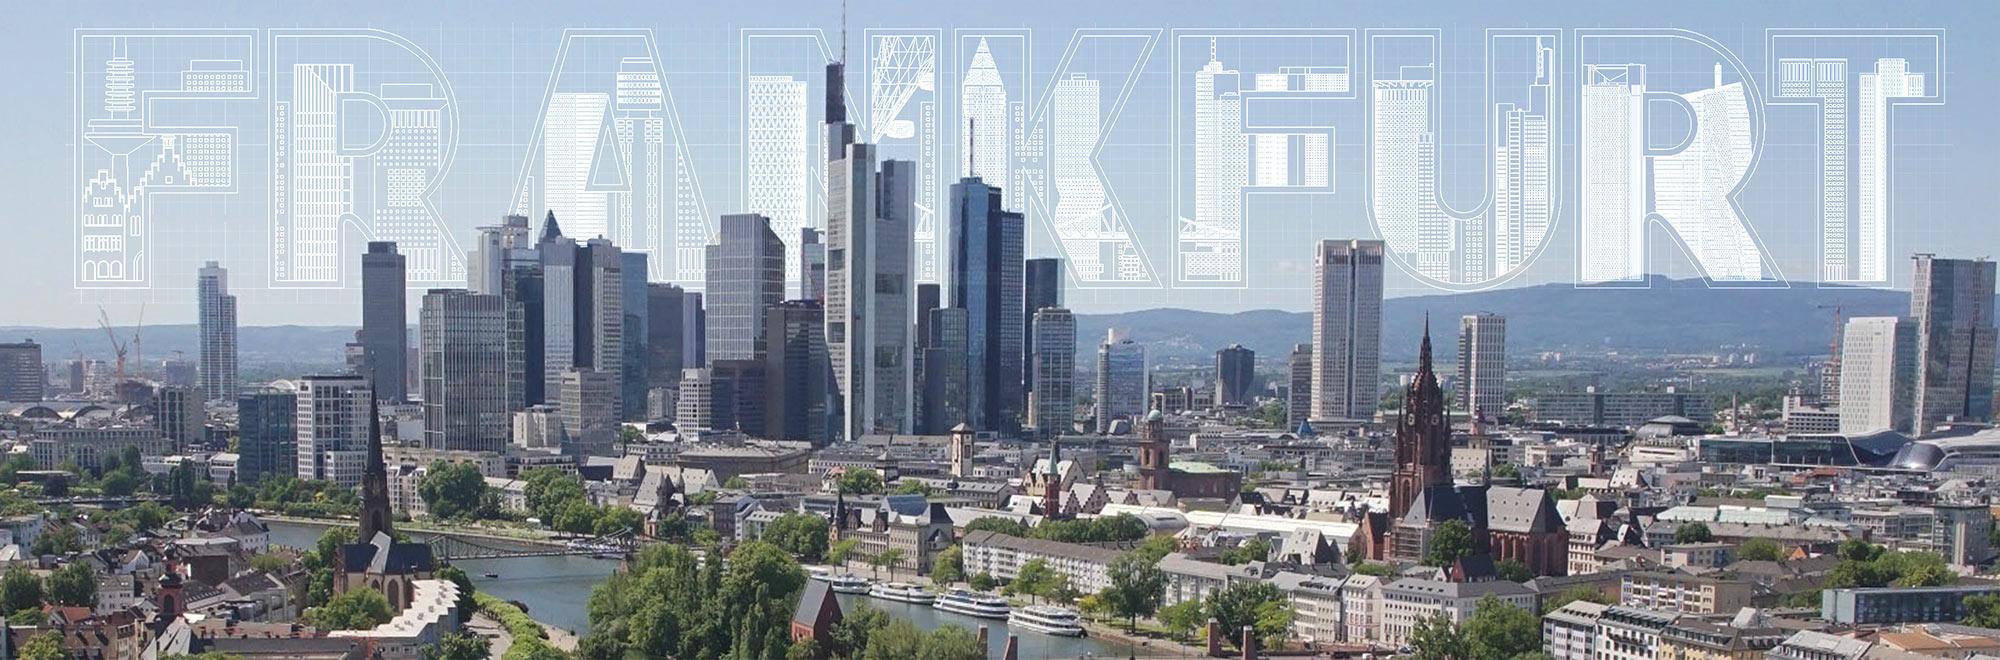 Frankfurt Skyline Druck - Schrift 3D Mainhattan